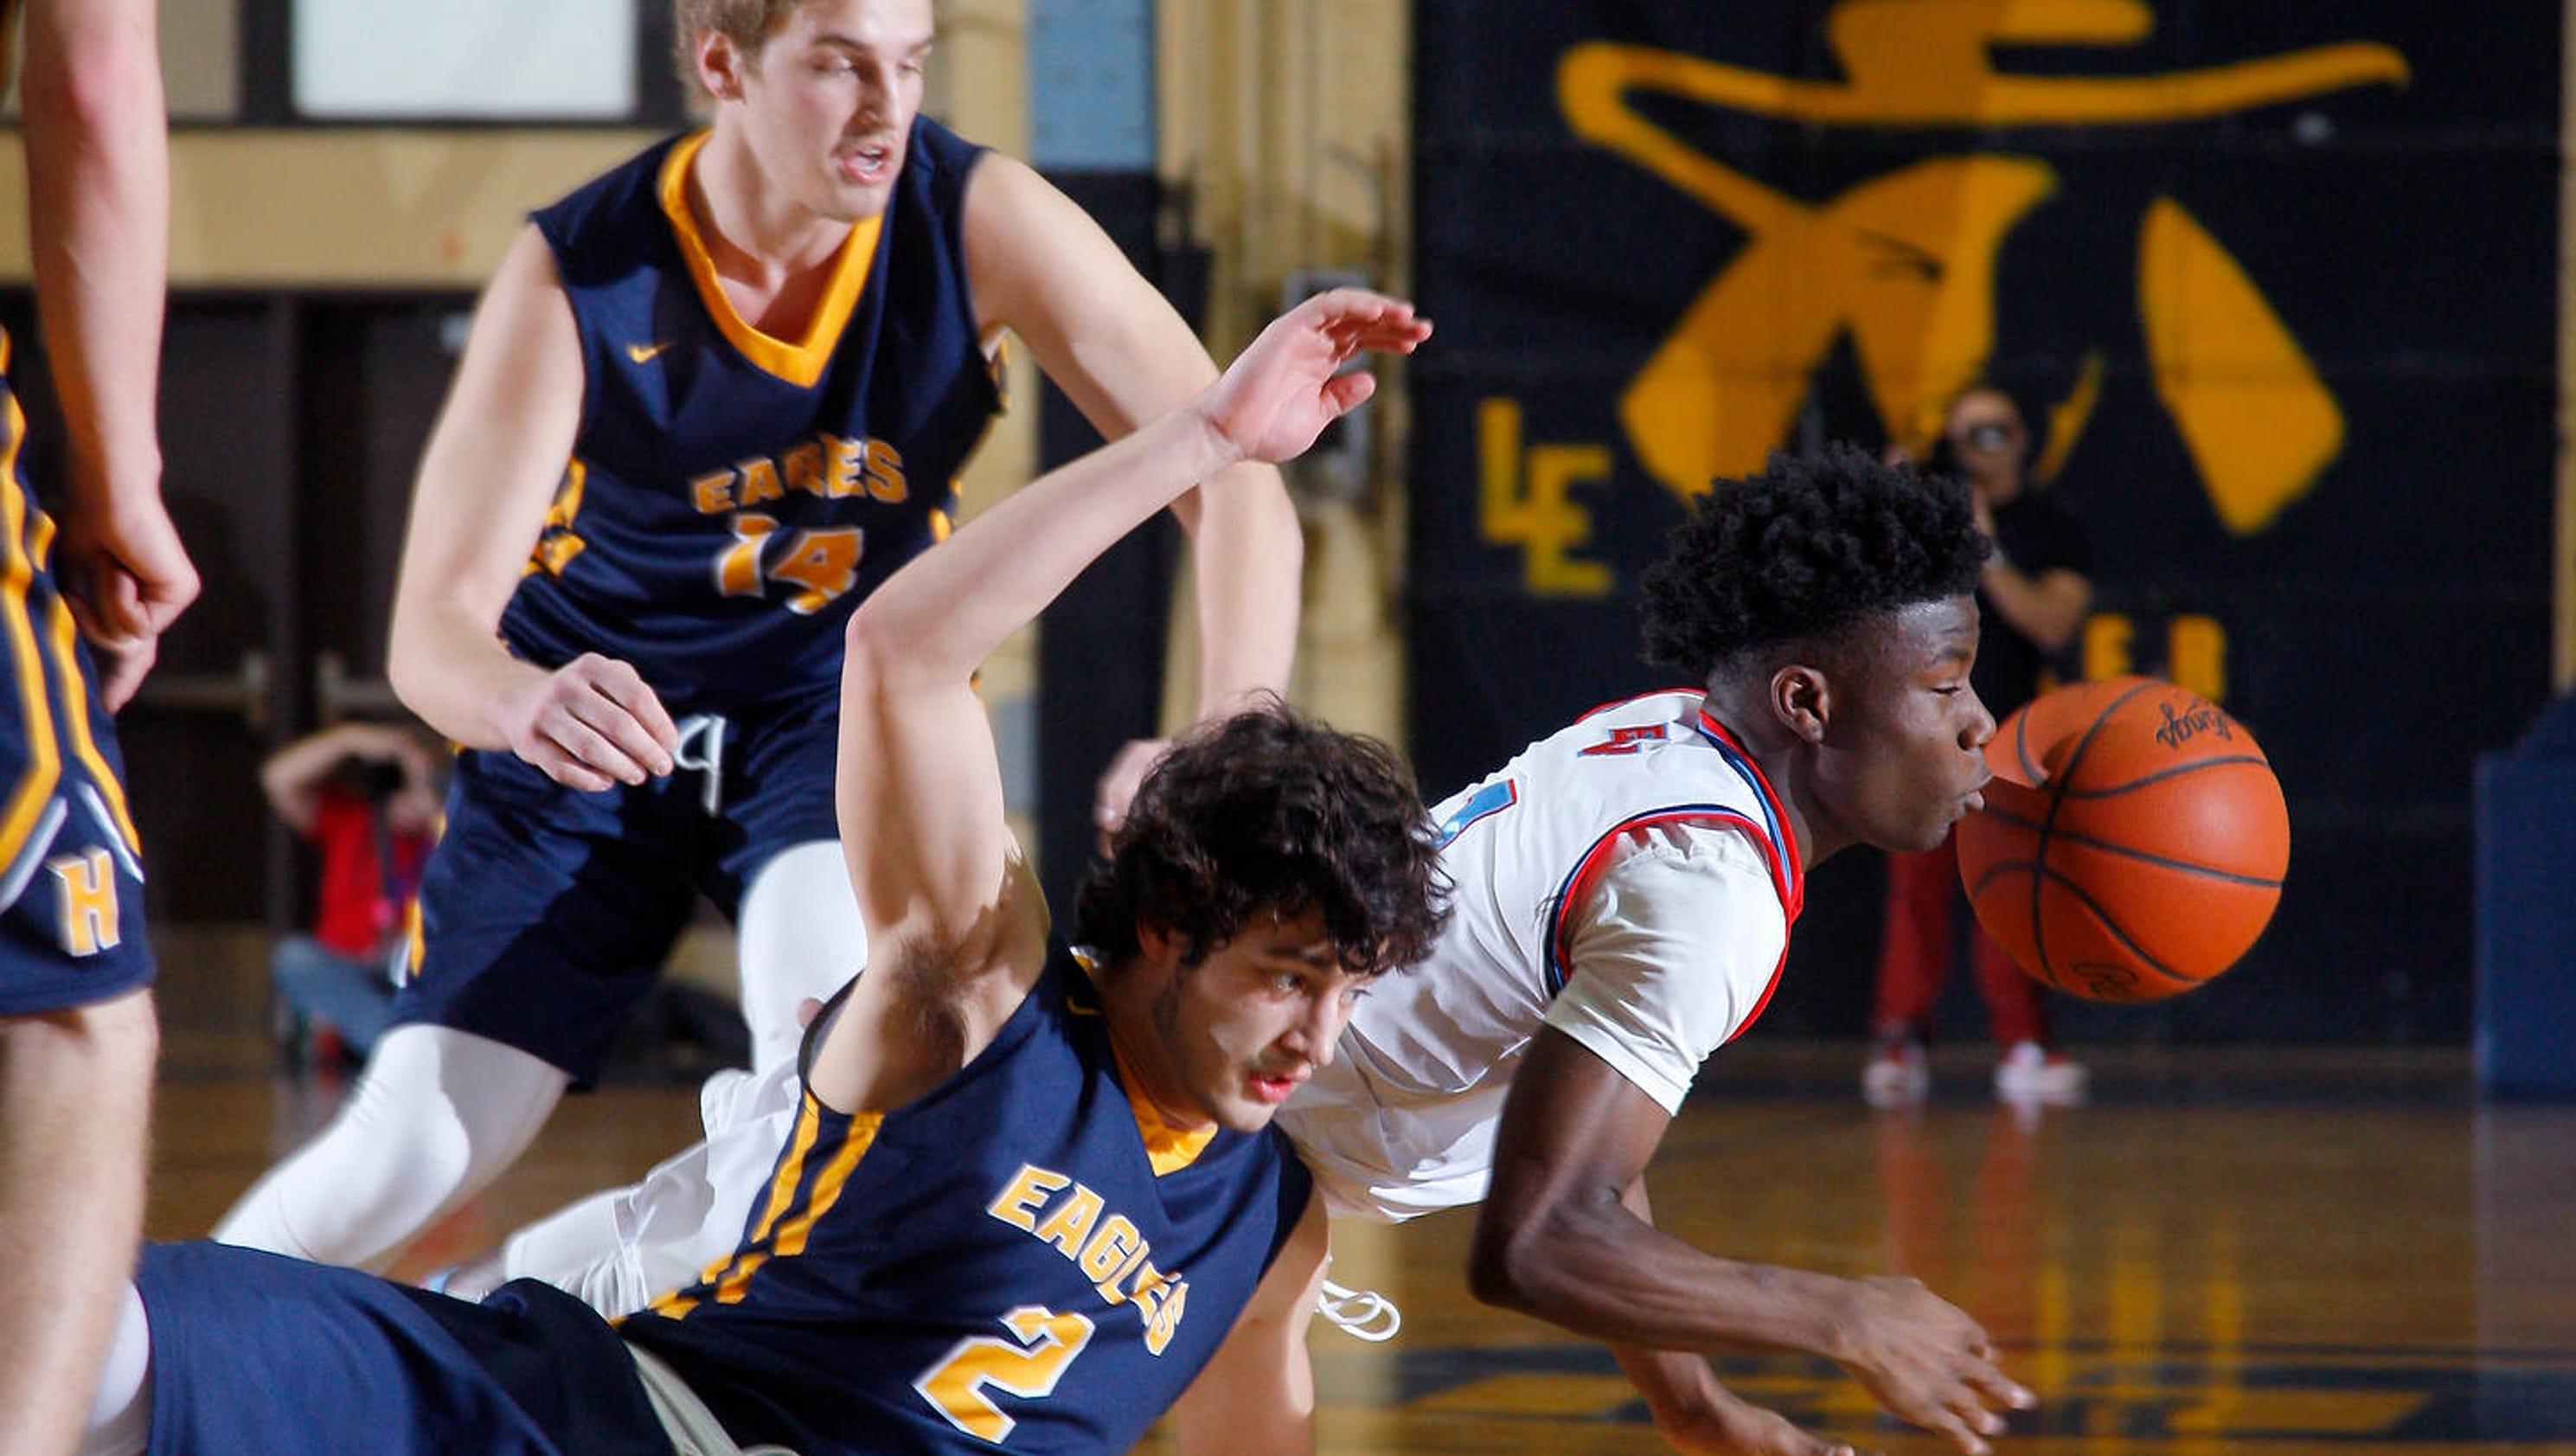 Photos: Everett vs Hudsonville Boys MHSAA Quarterfinals